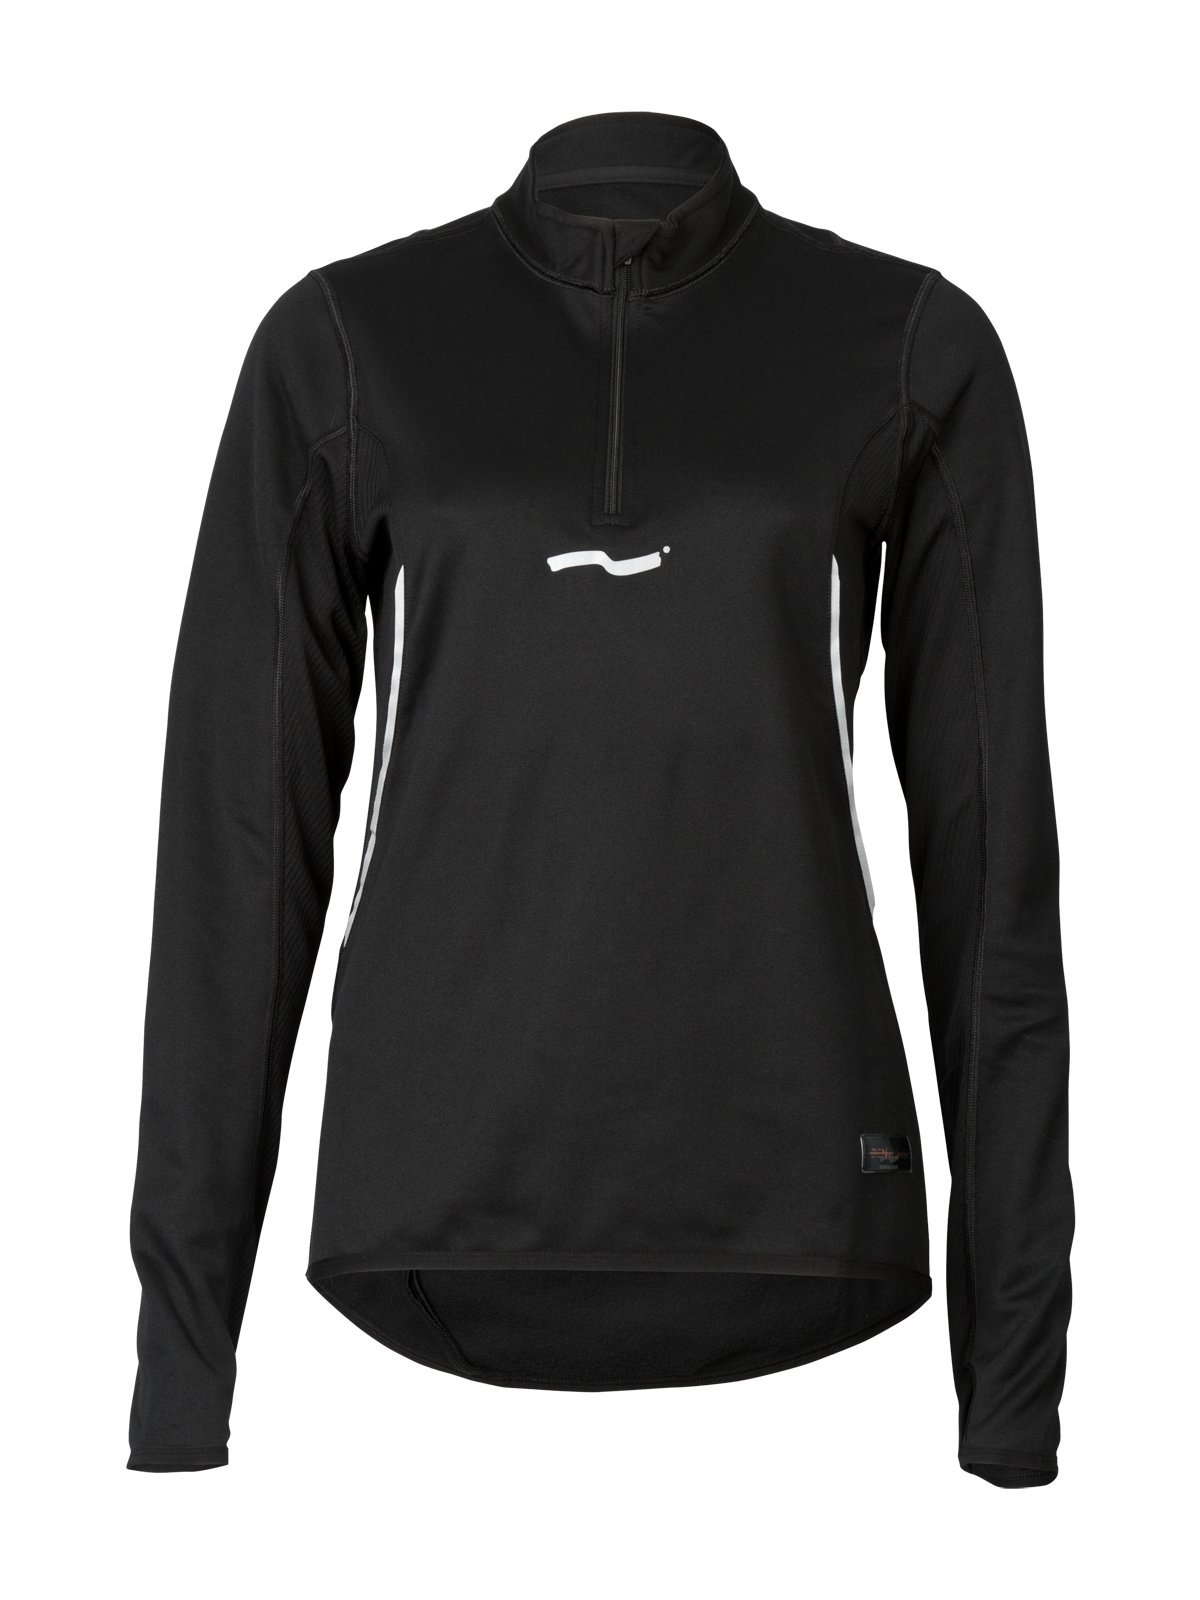 TAO Sportswear Damen Shirt Zentourion Running, Black, 34